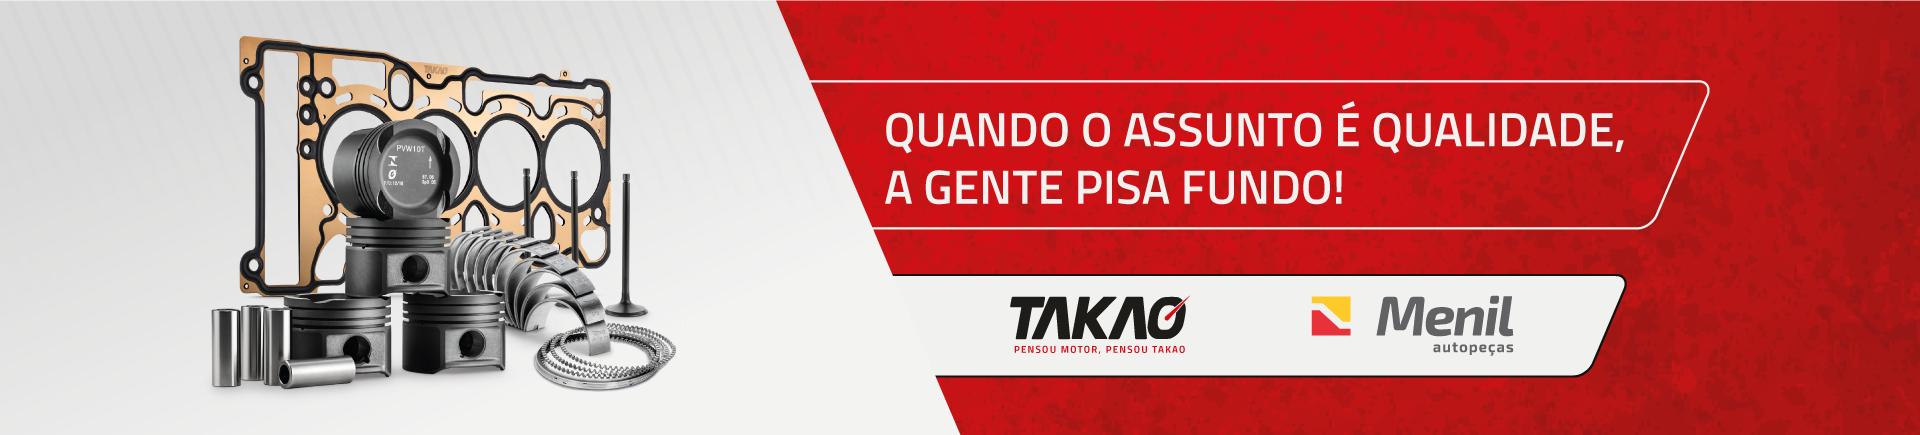 https://menilautopecas.com.br/Takao 14-jul-21